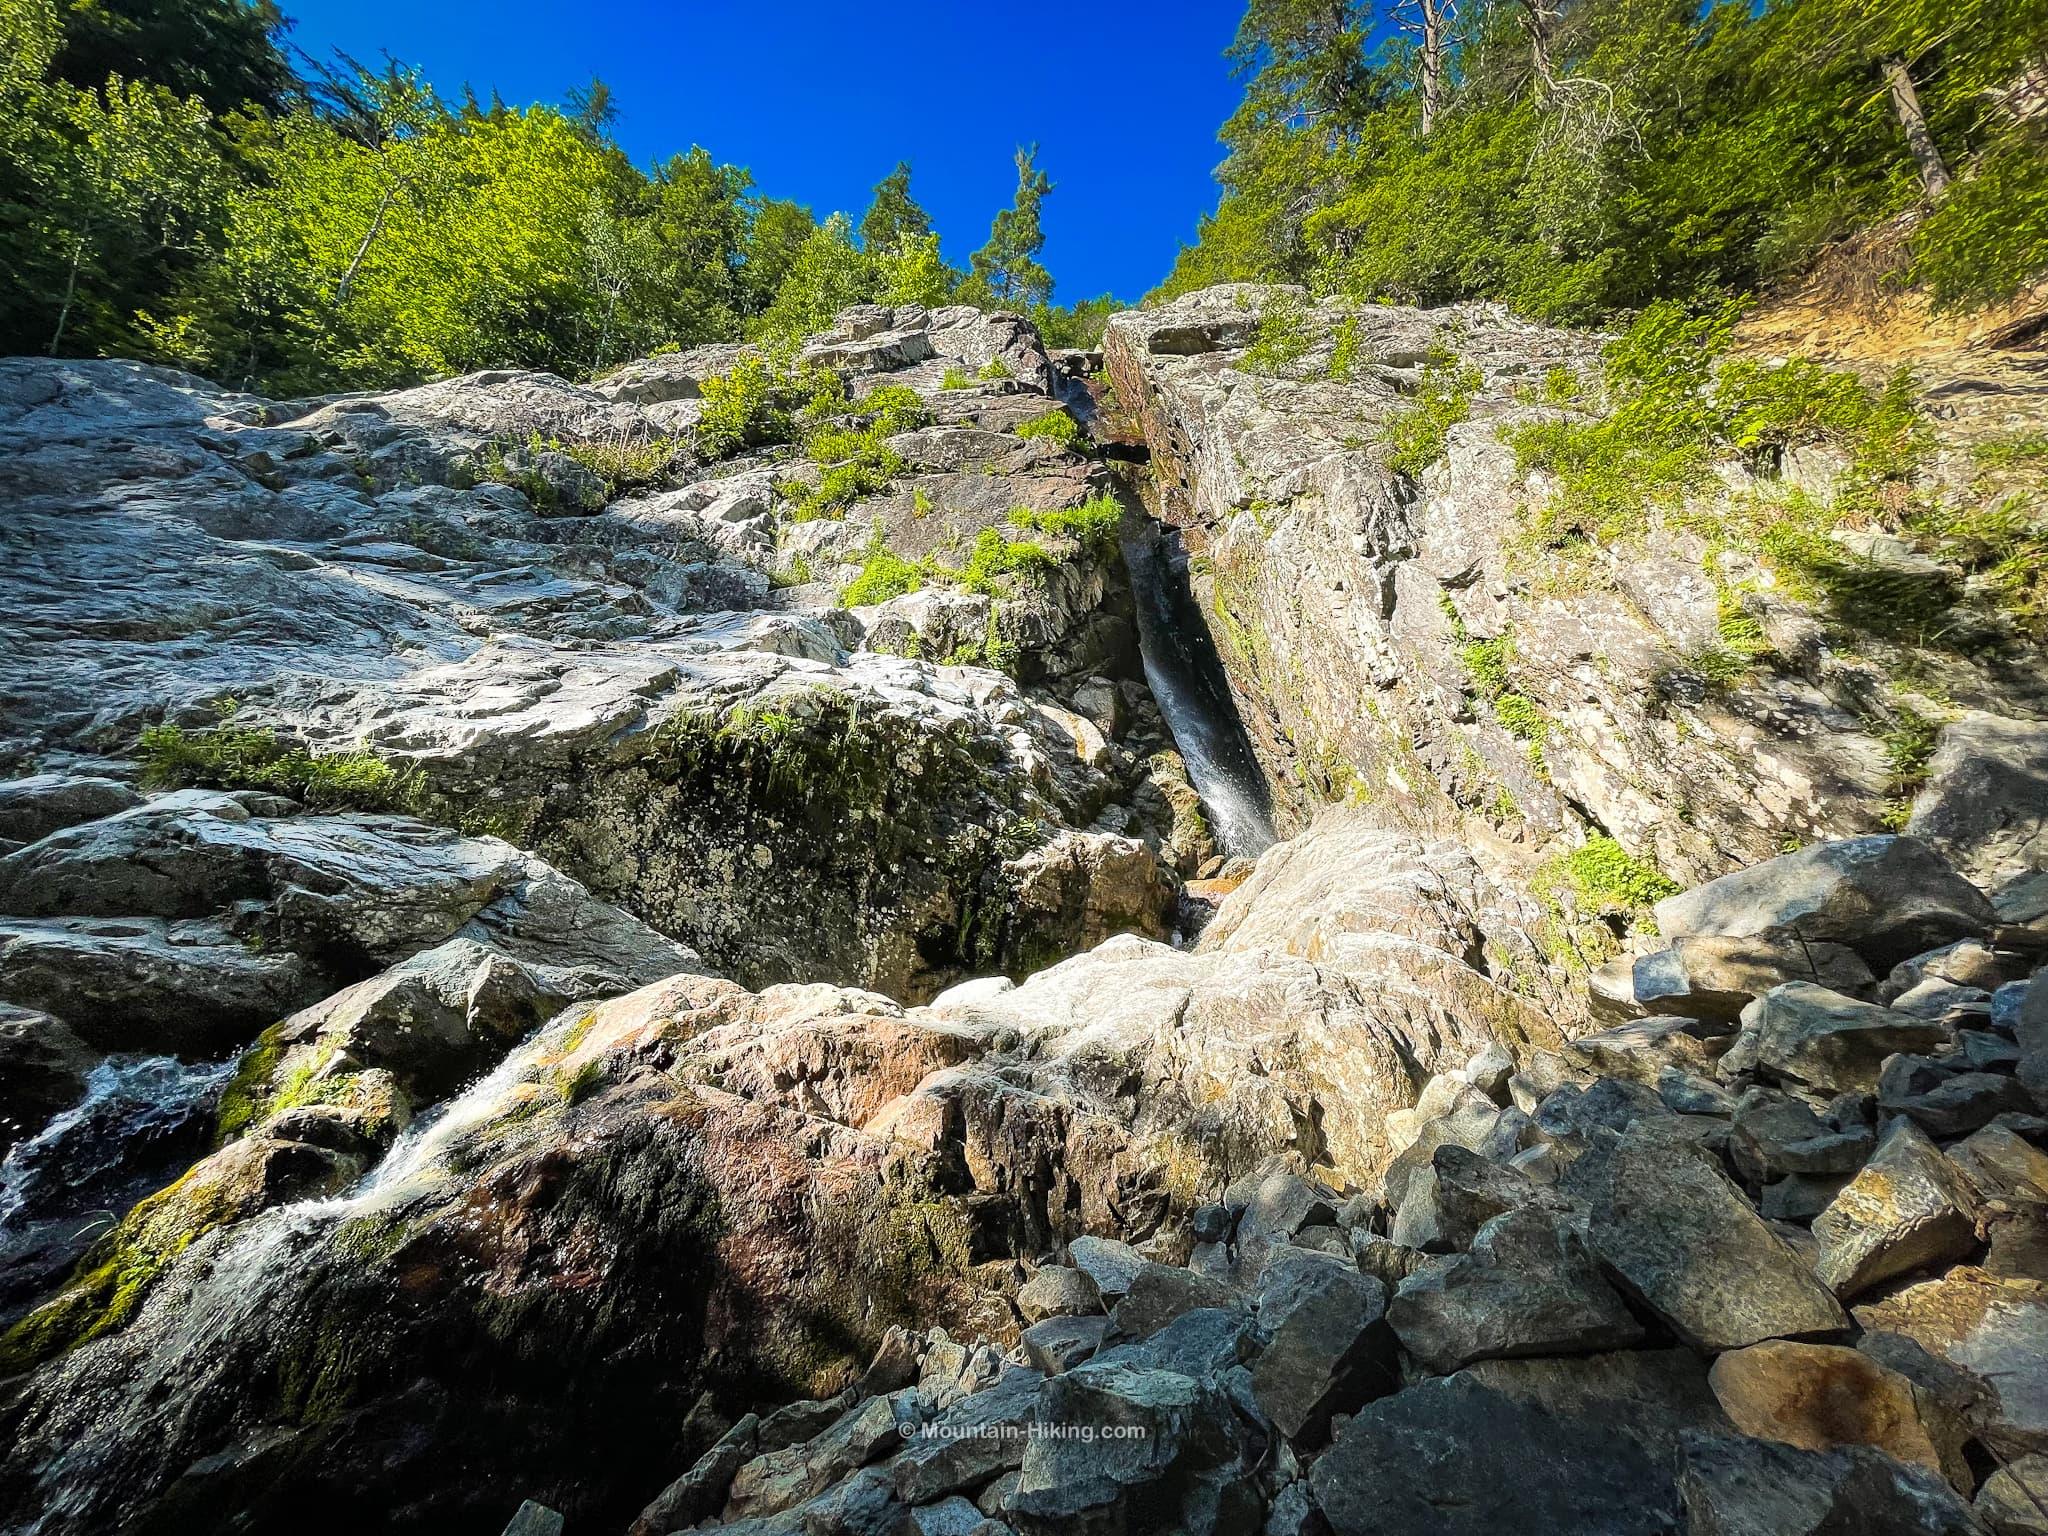 roaring brook falls seen from below